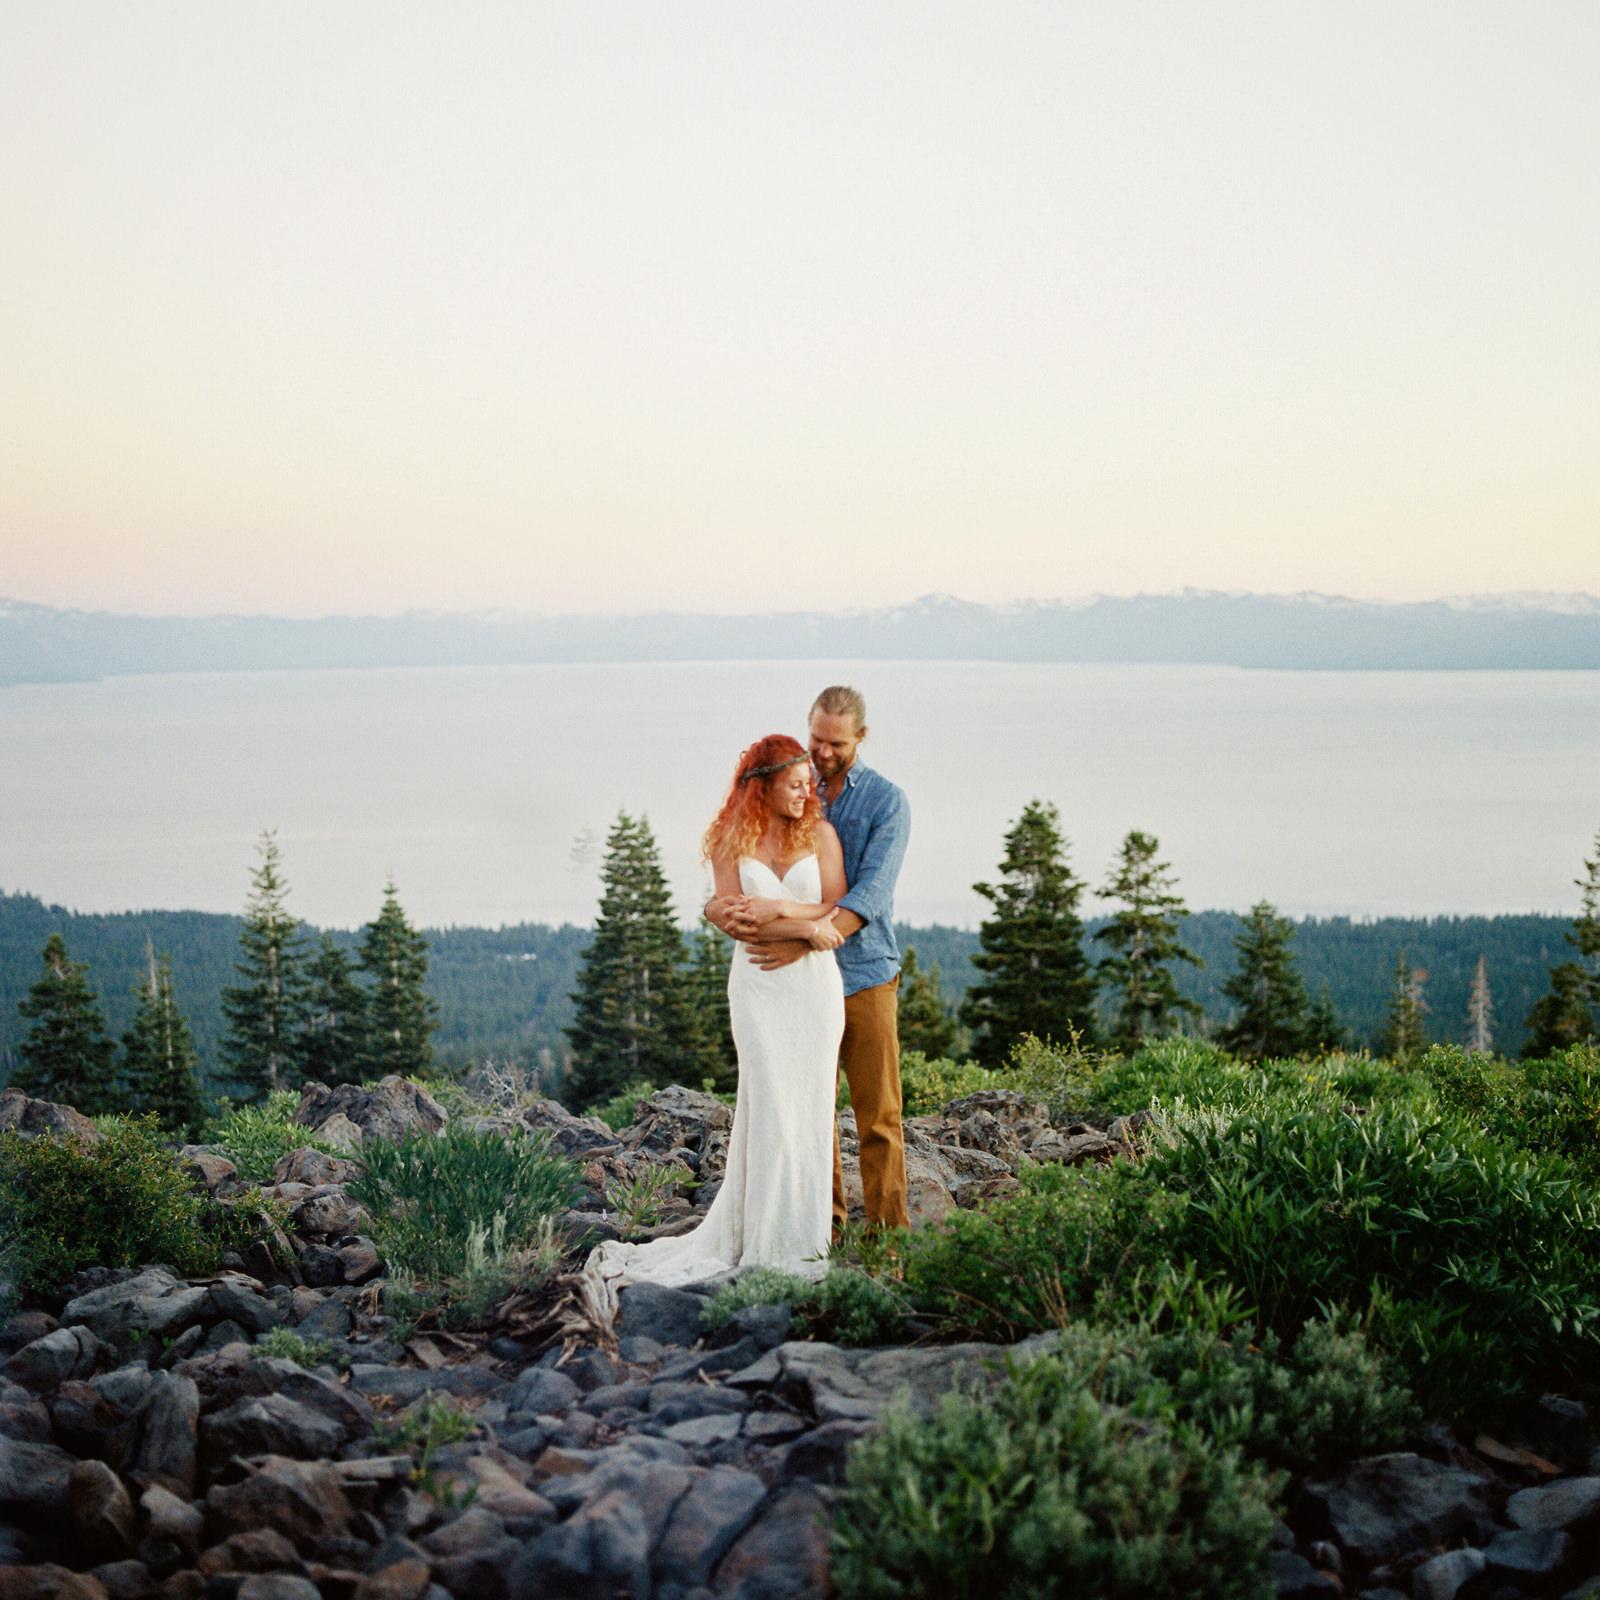 lake-tahoe-elopement-122 LAKE TAHOE ELOPEMENT